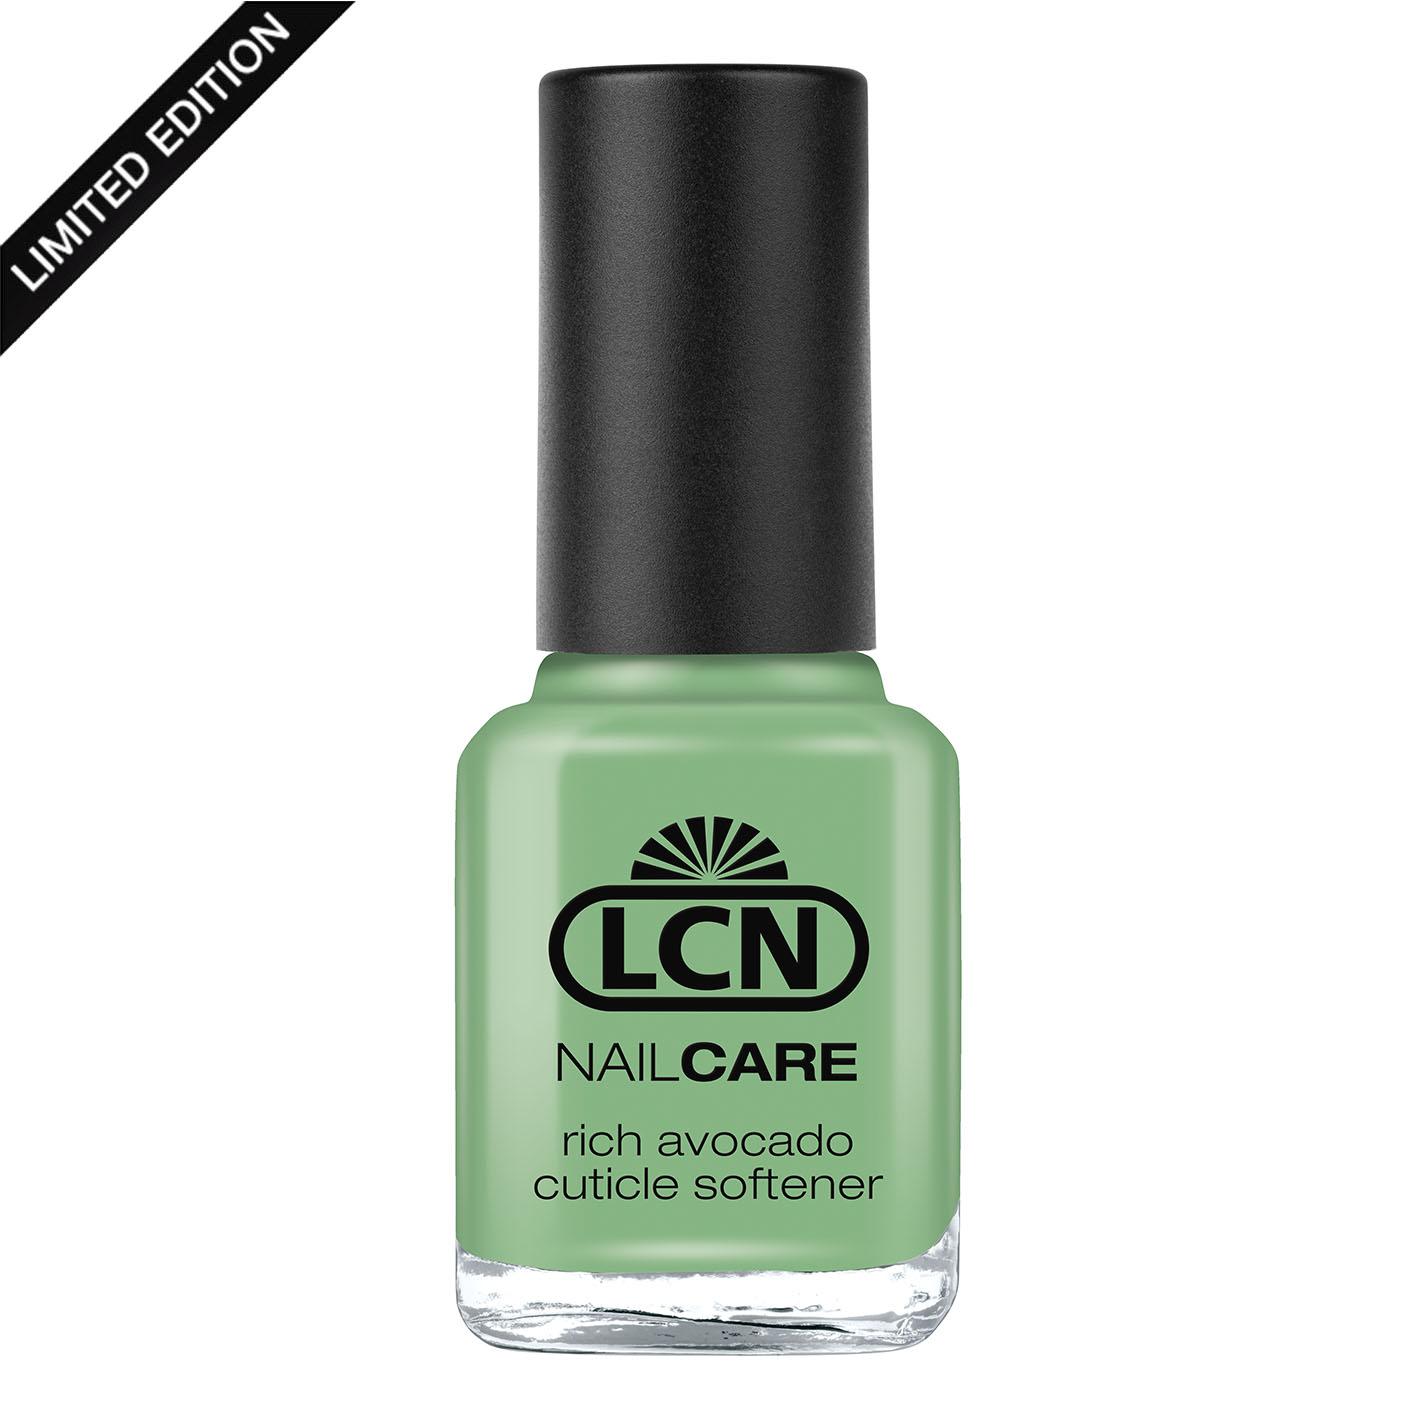 Rich Avocado Cuticle Softener — Салон красоты Nadlen Nail